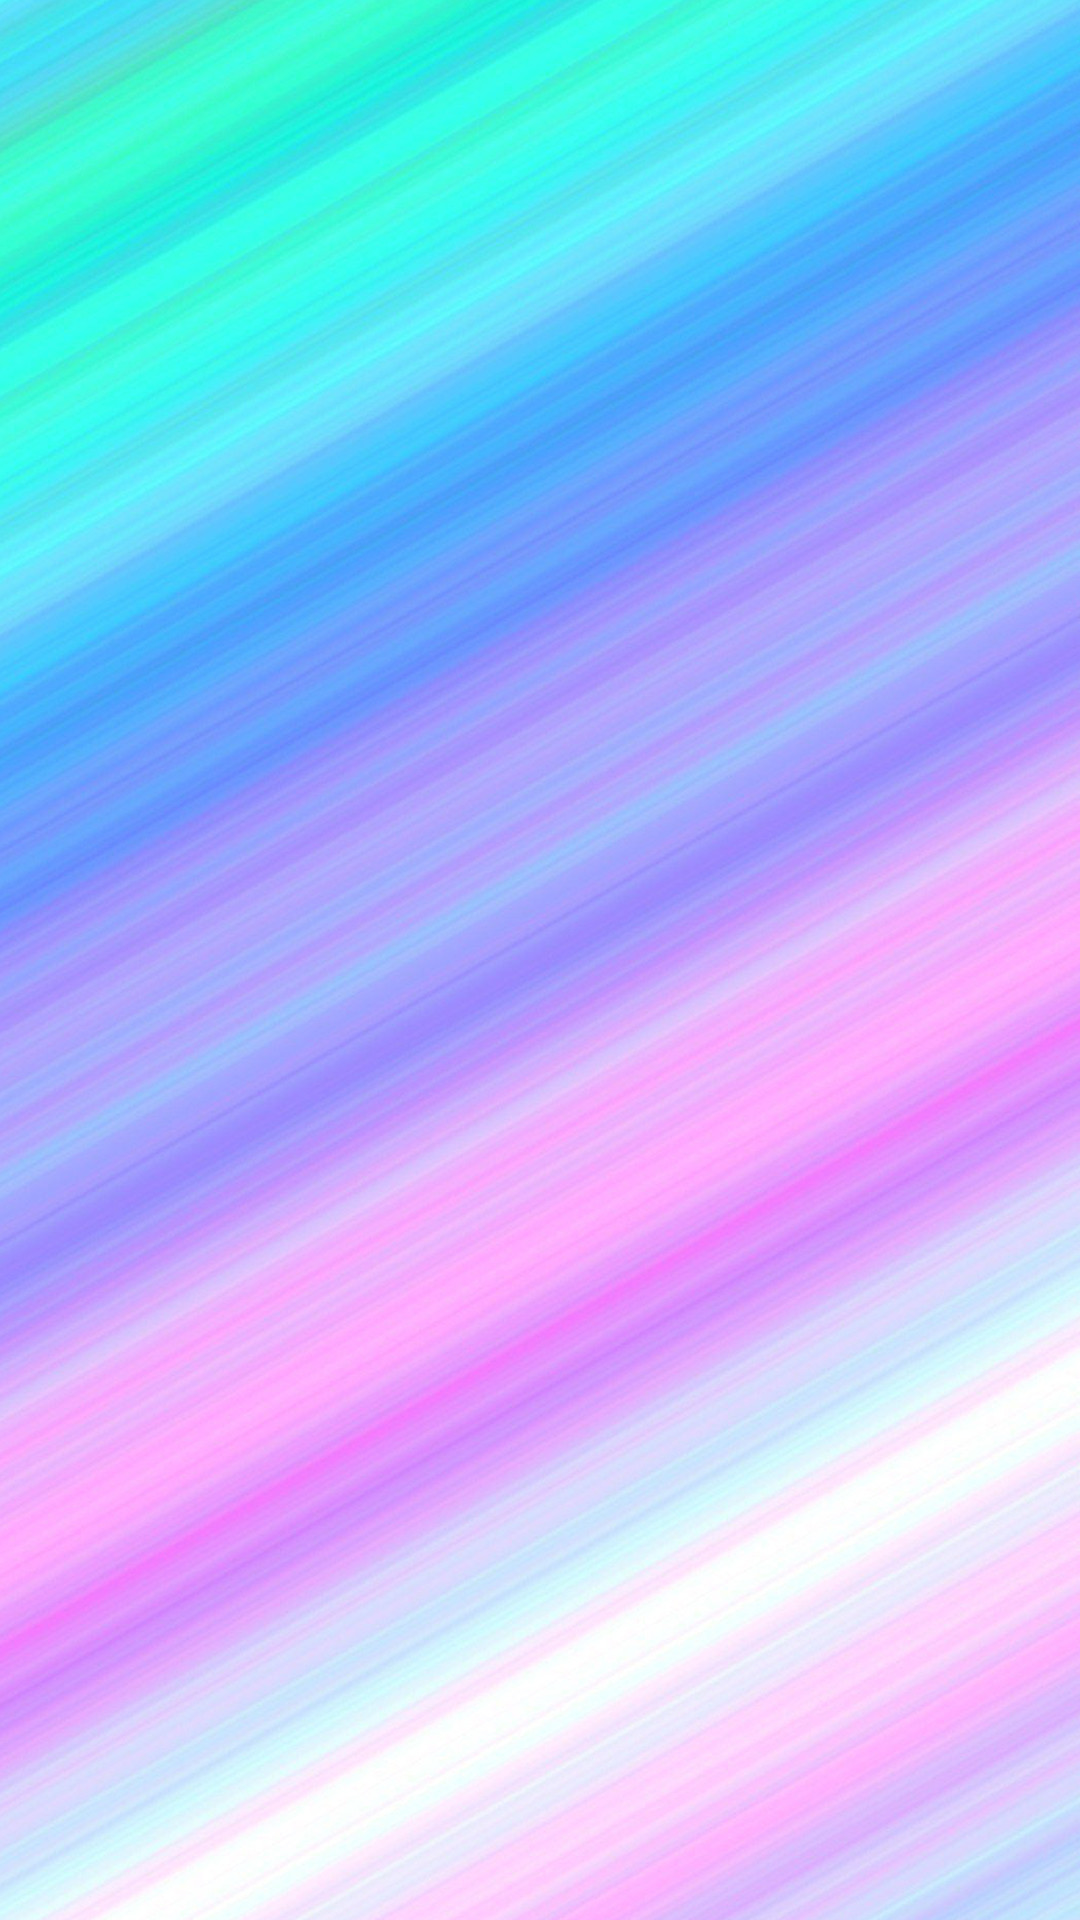 High resolution wallpaper background ID 77700451486